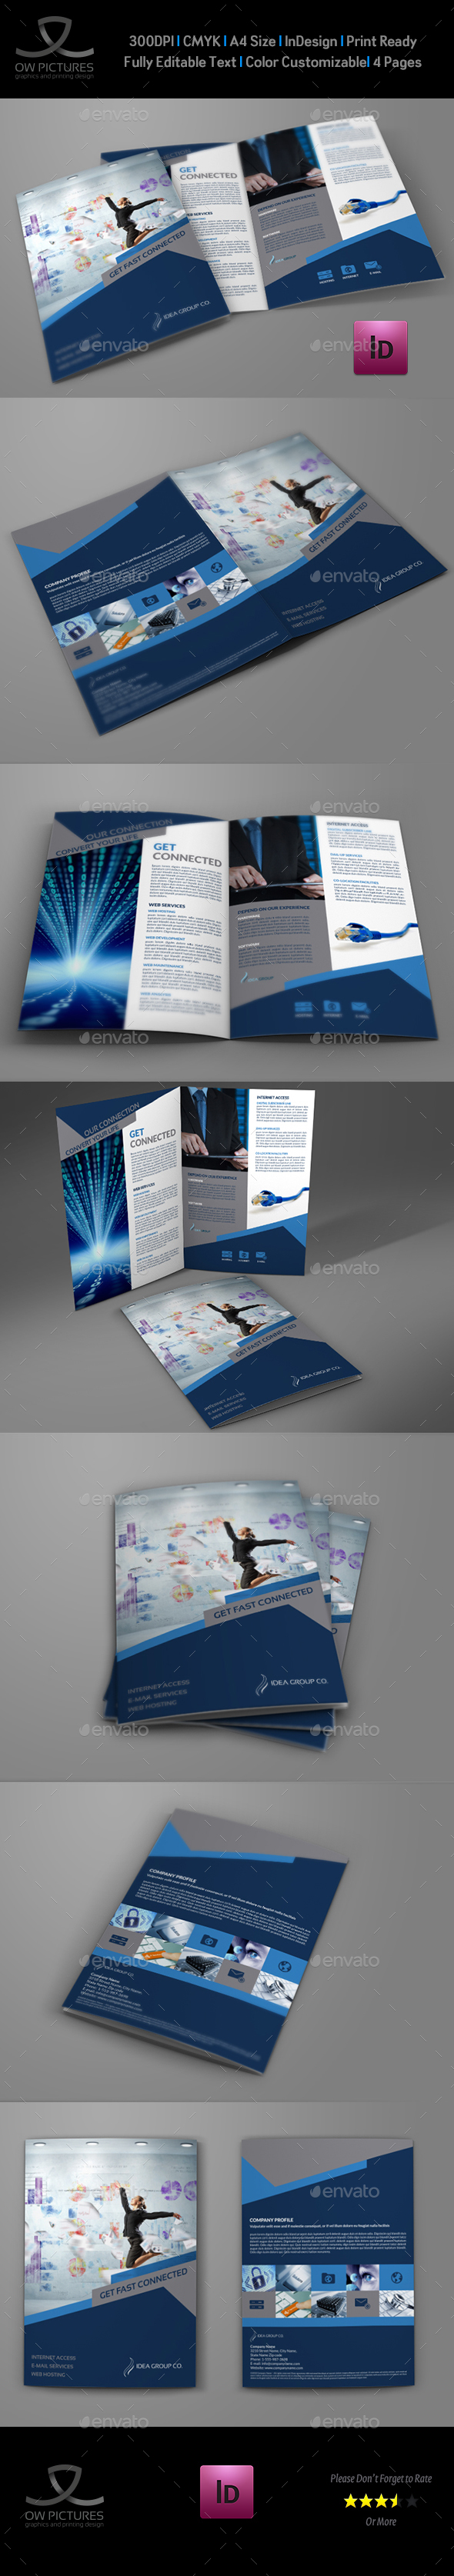 Internet Provider Services Bi-Fold Brochure - Brochures Print Templates